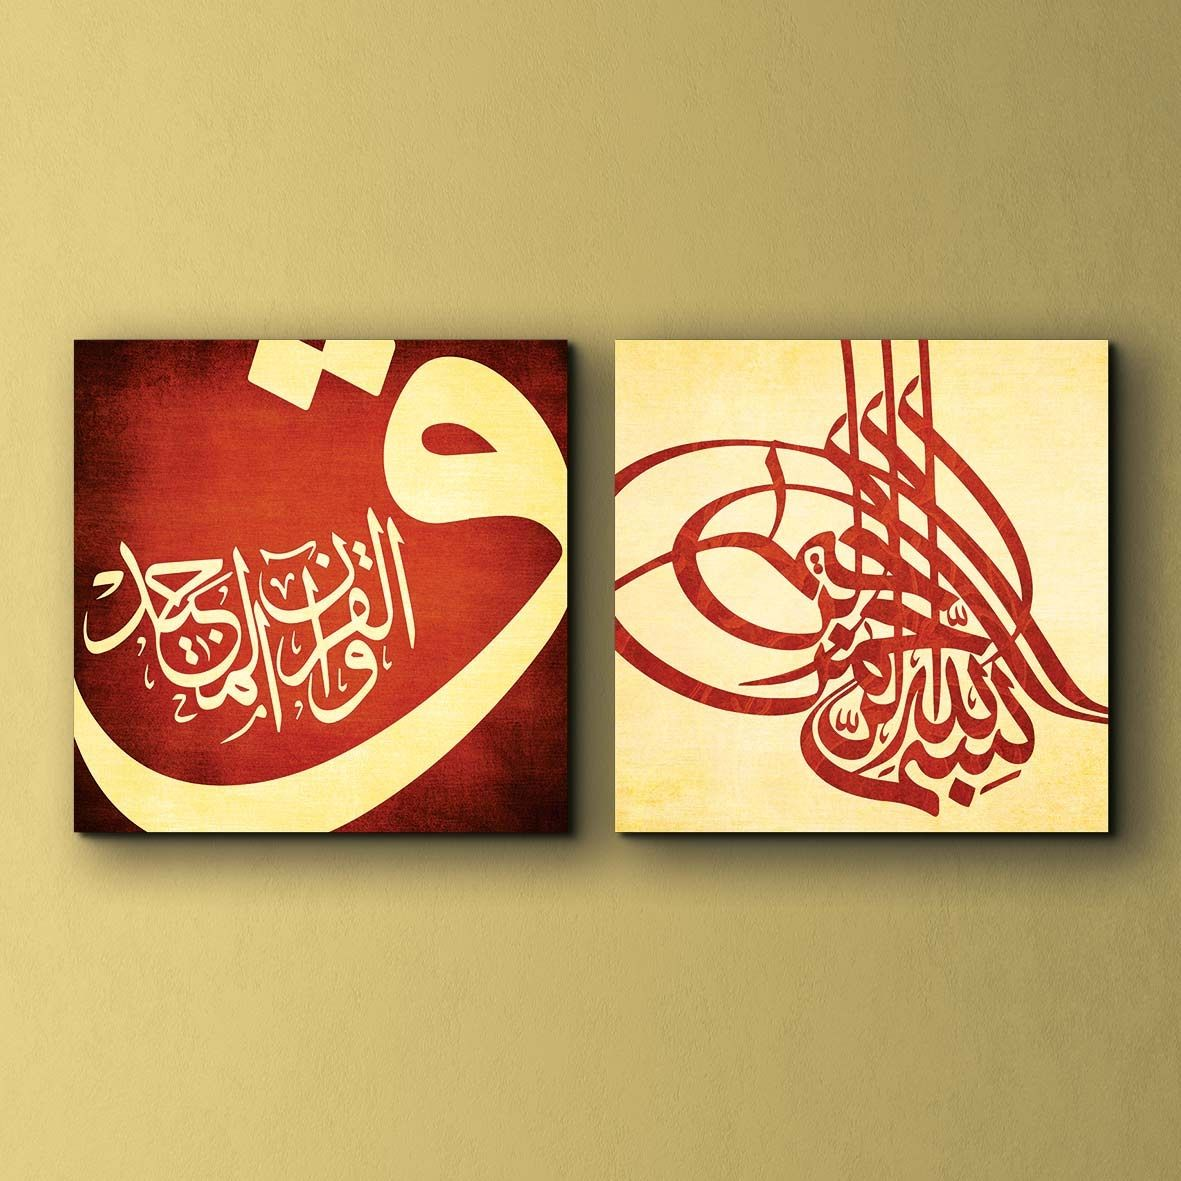 Magnificent Islamic Canvas Wall Art Photo - Art & Wall Decor ...